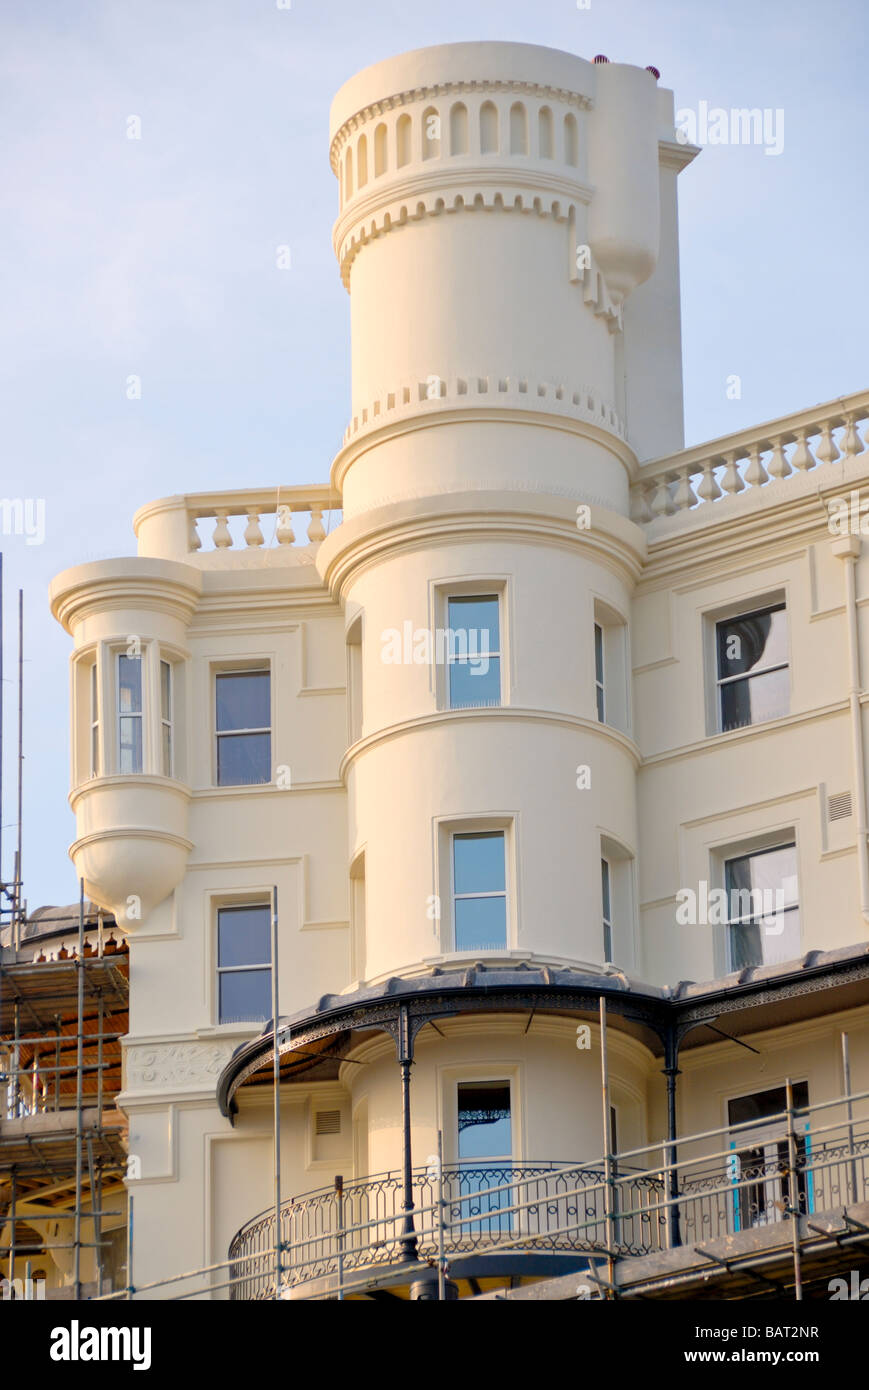 The Palace Hotel Southend on Sea Essex England UK - Stock Image